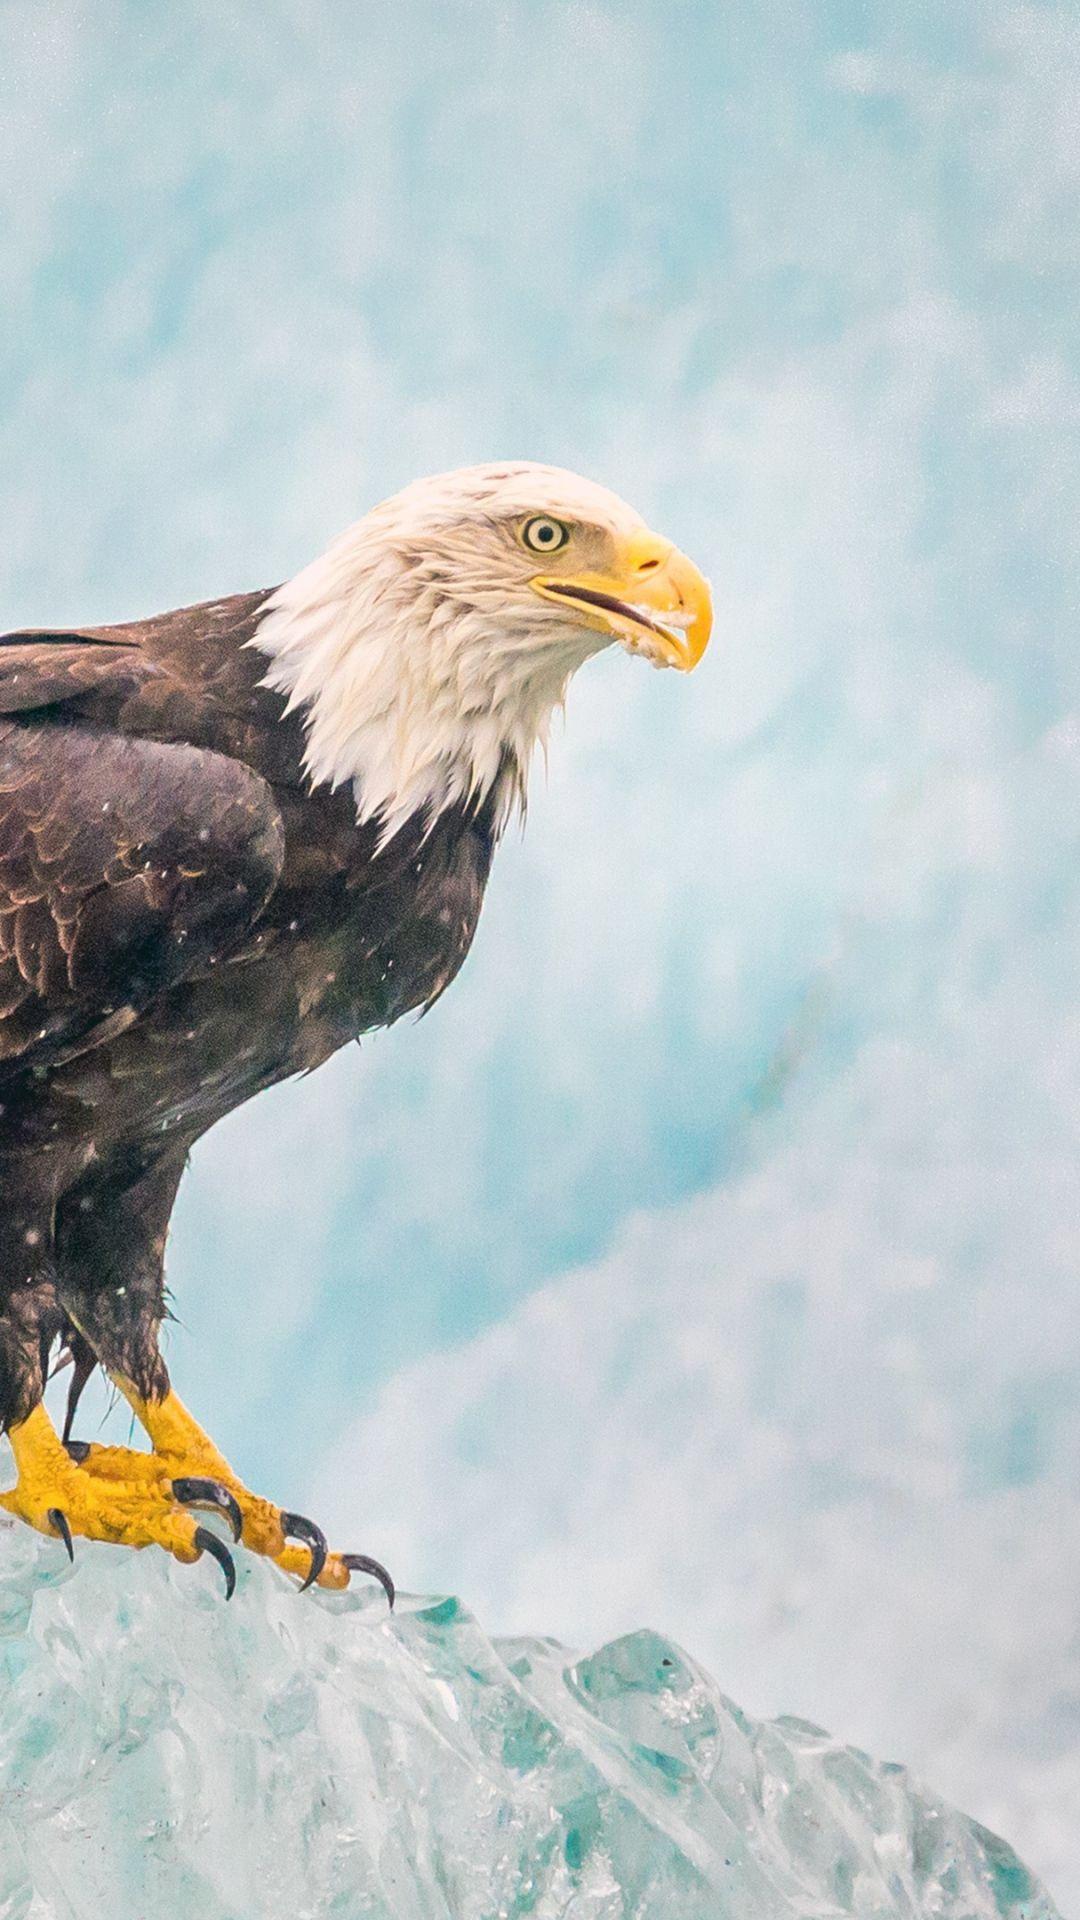 Eagle Bird Predator Ice Iphone 8 Wallpapers Eagle Wallpaper